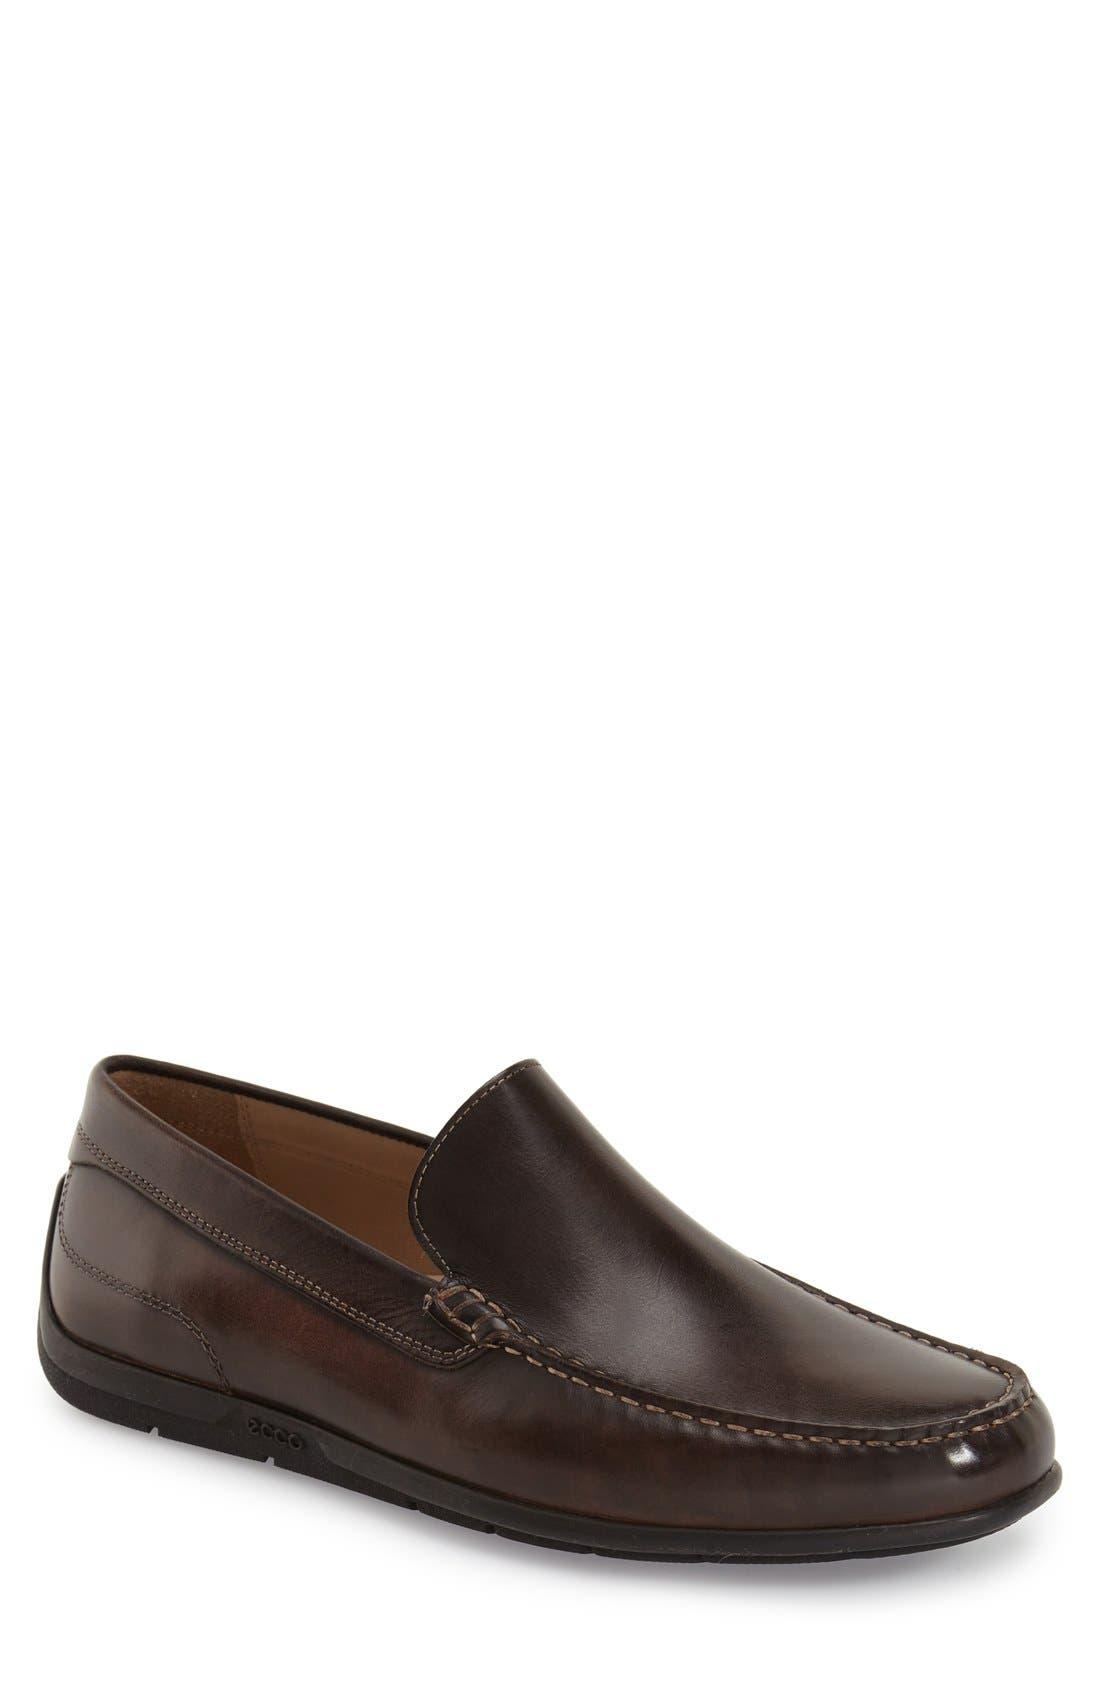 Main Image - ECCO 'Classic Moc II' Venetian Loafer (Men)